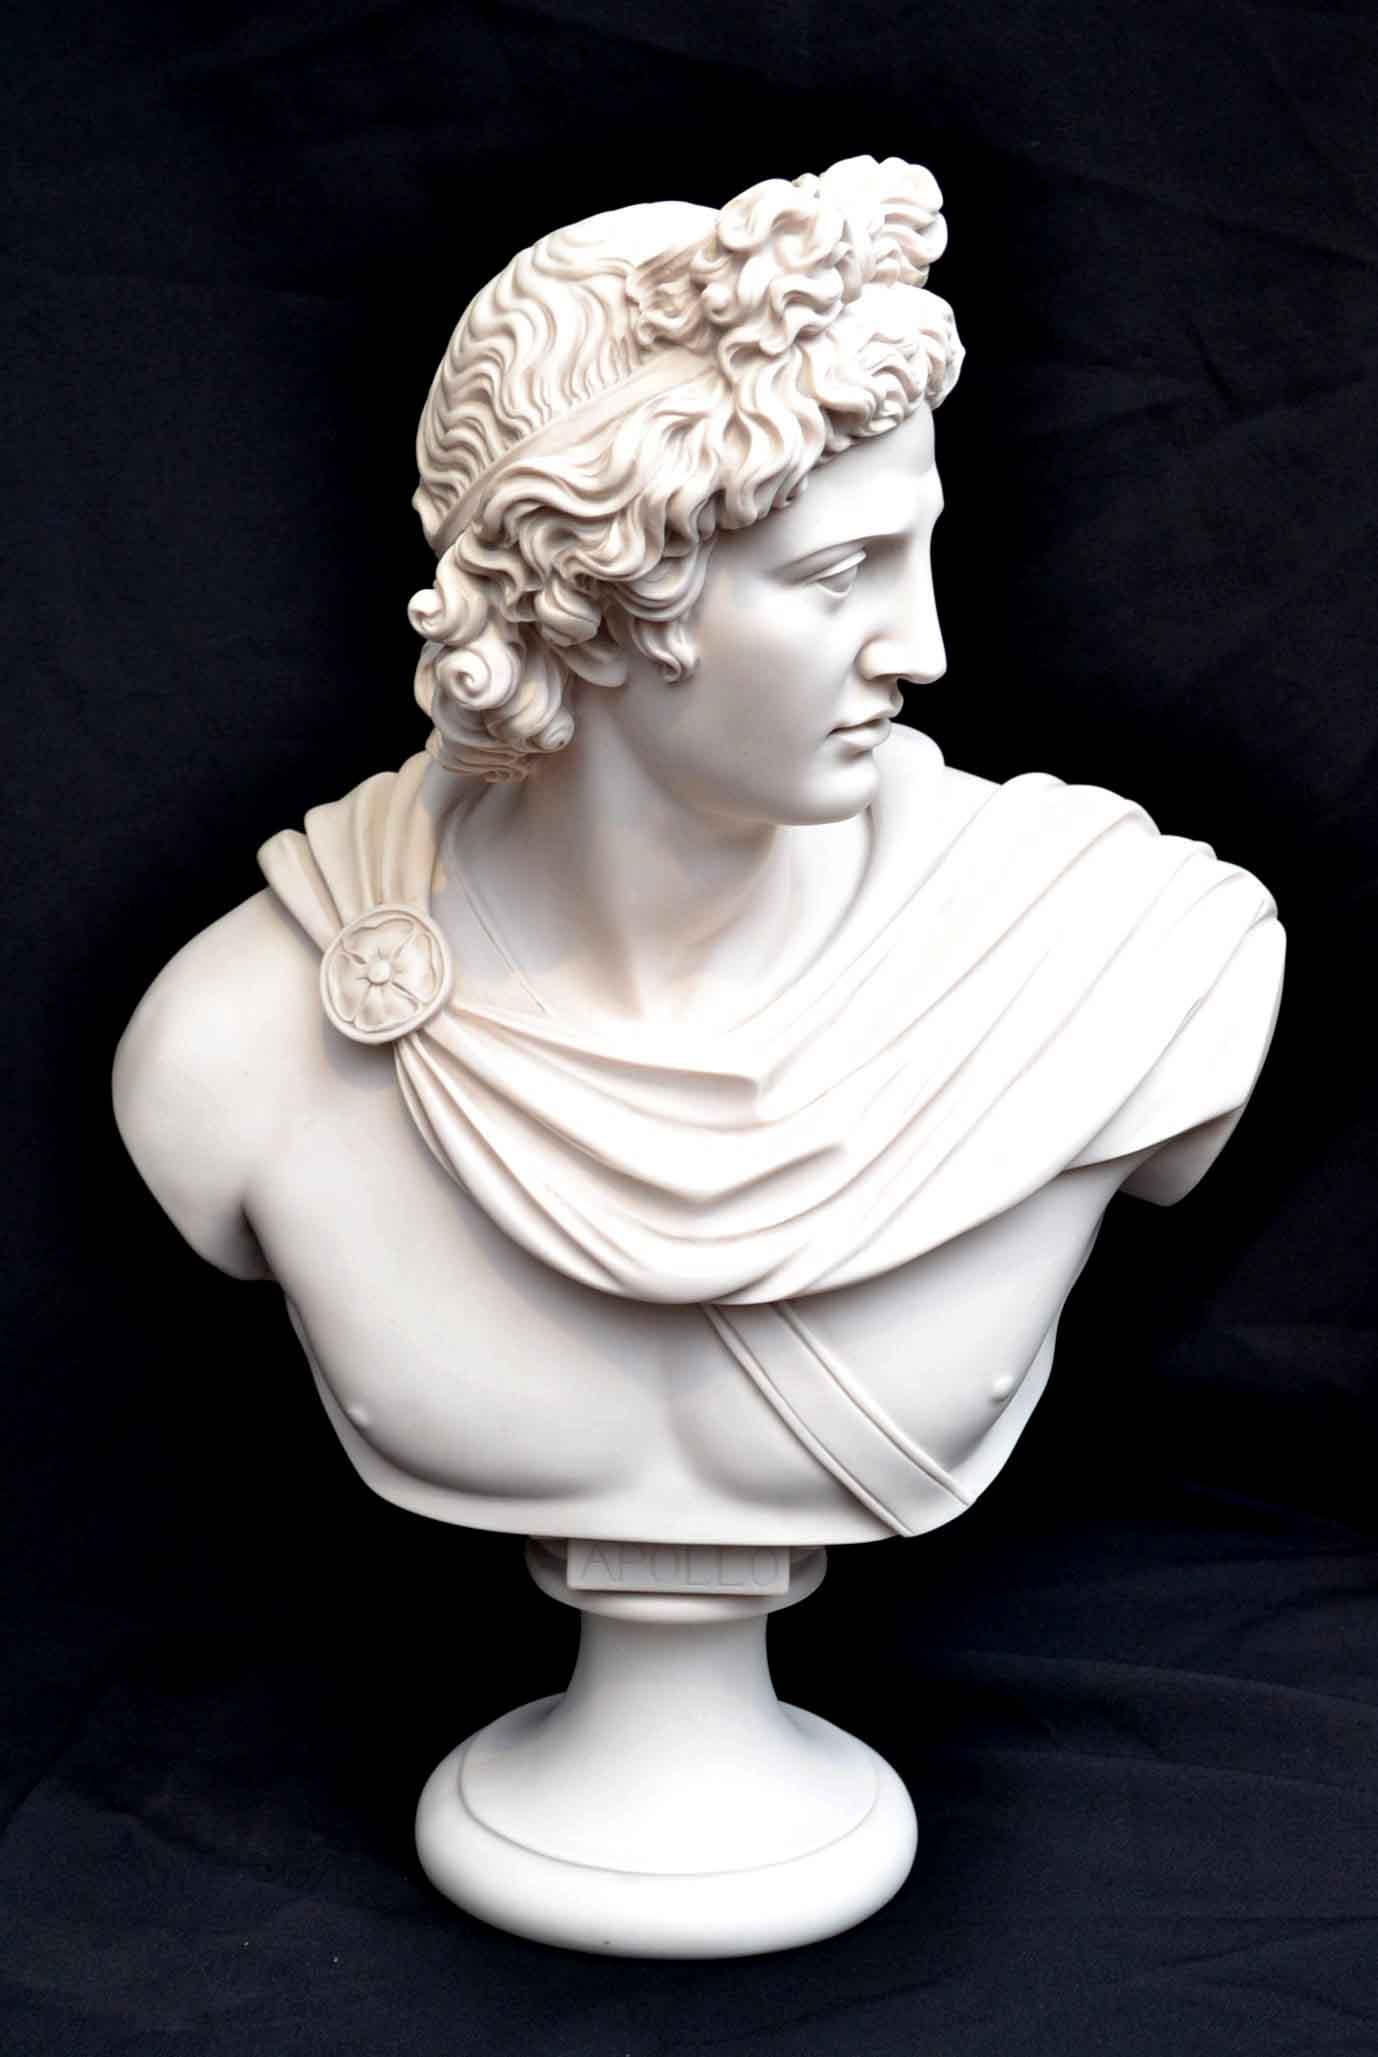 Regent Antiques Marble Stunning Marble Bust of Greek  : 04049 Stunning Marble Bust of Greek God Apollo 12 from www.regentantiques.com size 1378 x 2057 jpeg 98kB